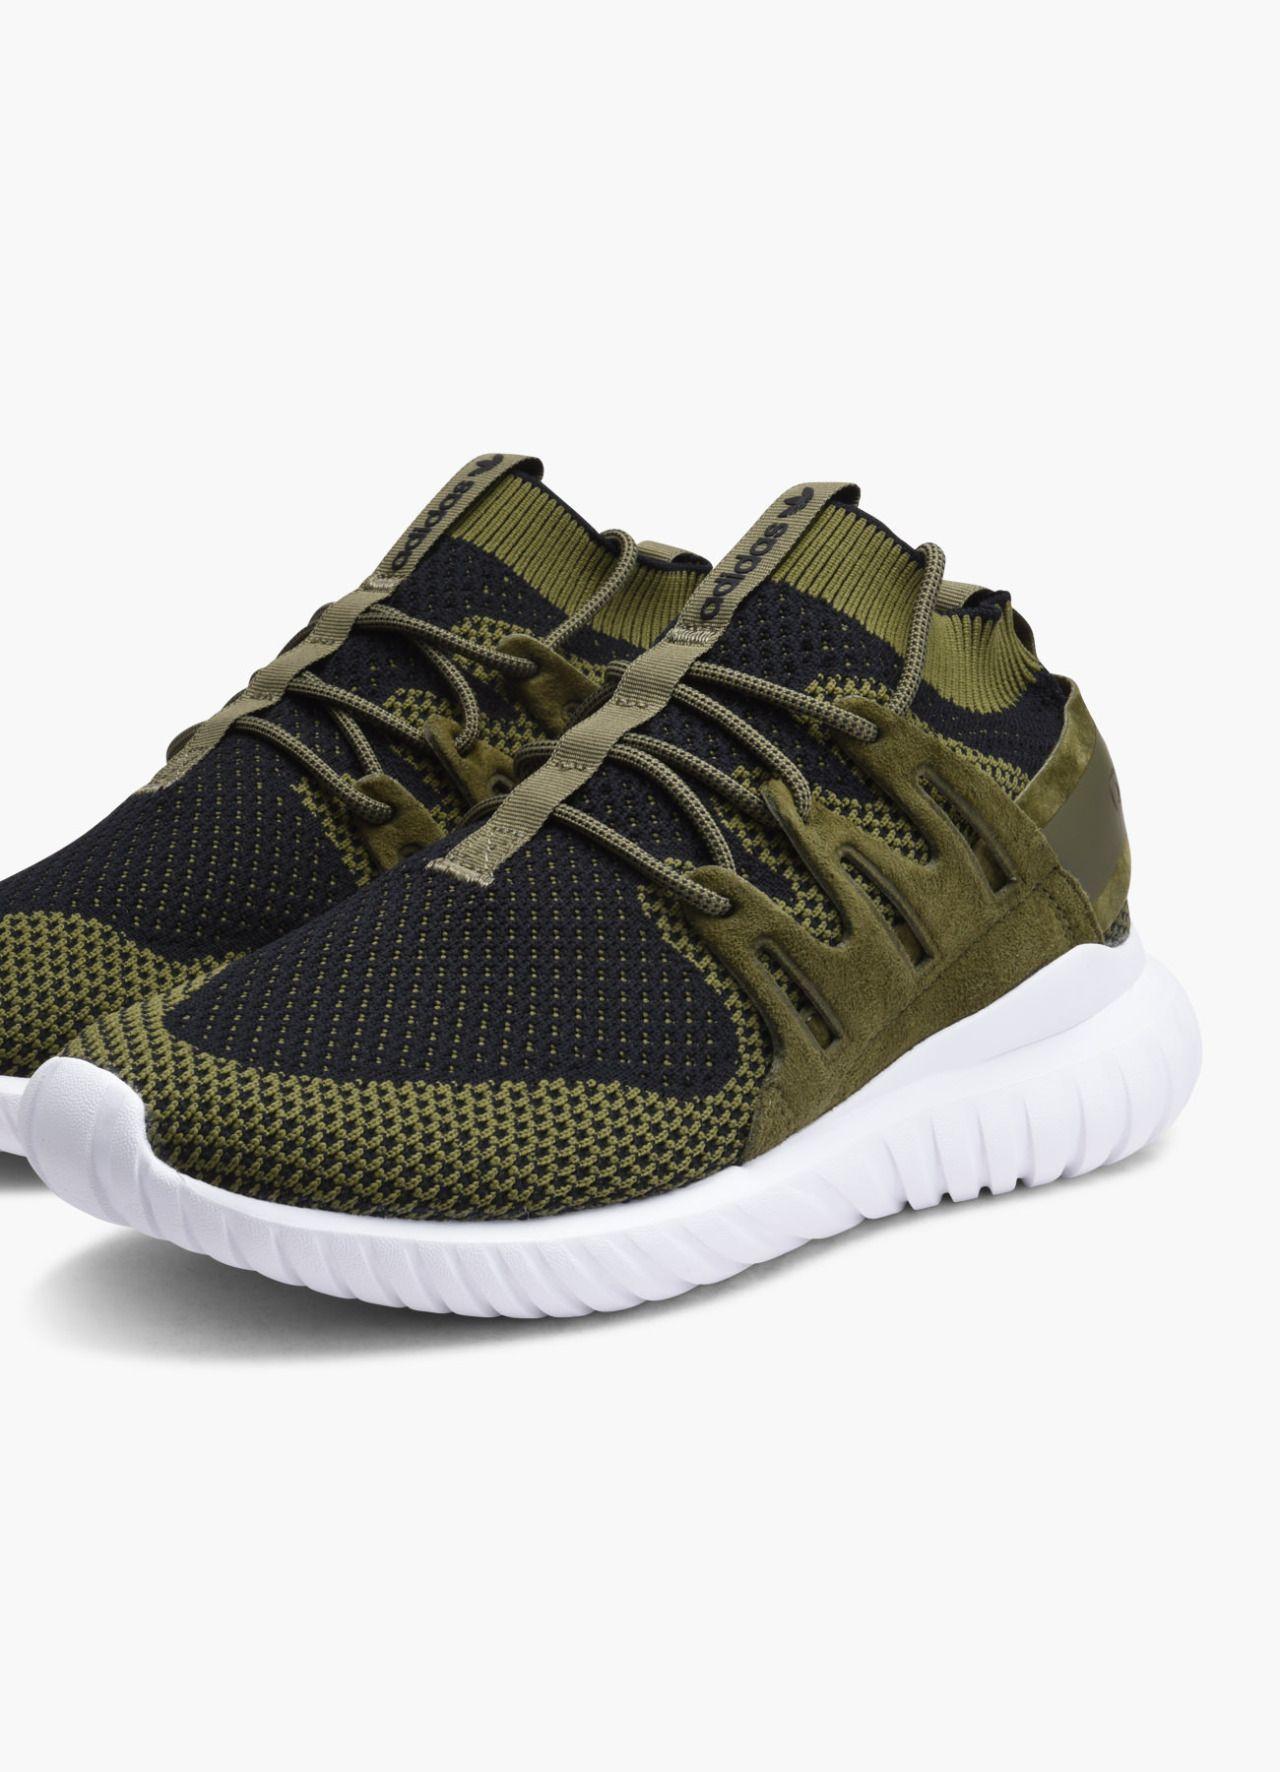 the best attitude 80474 28997 Adidas Tubular Nova Primeknit Olive Cargo Core Black  sneakernews  Sneakers   StreetStyle  Kicks  adidas  nike  vans  newbalance  puma  ADIDAS  ASICS ...